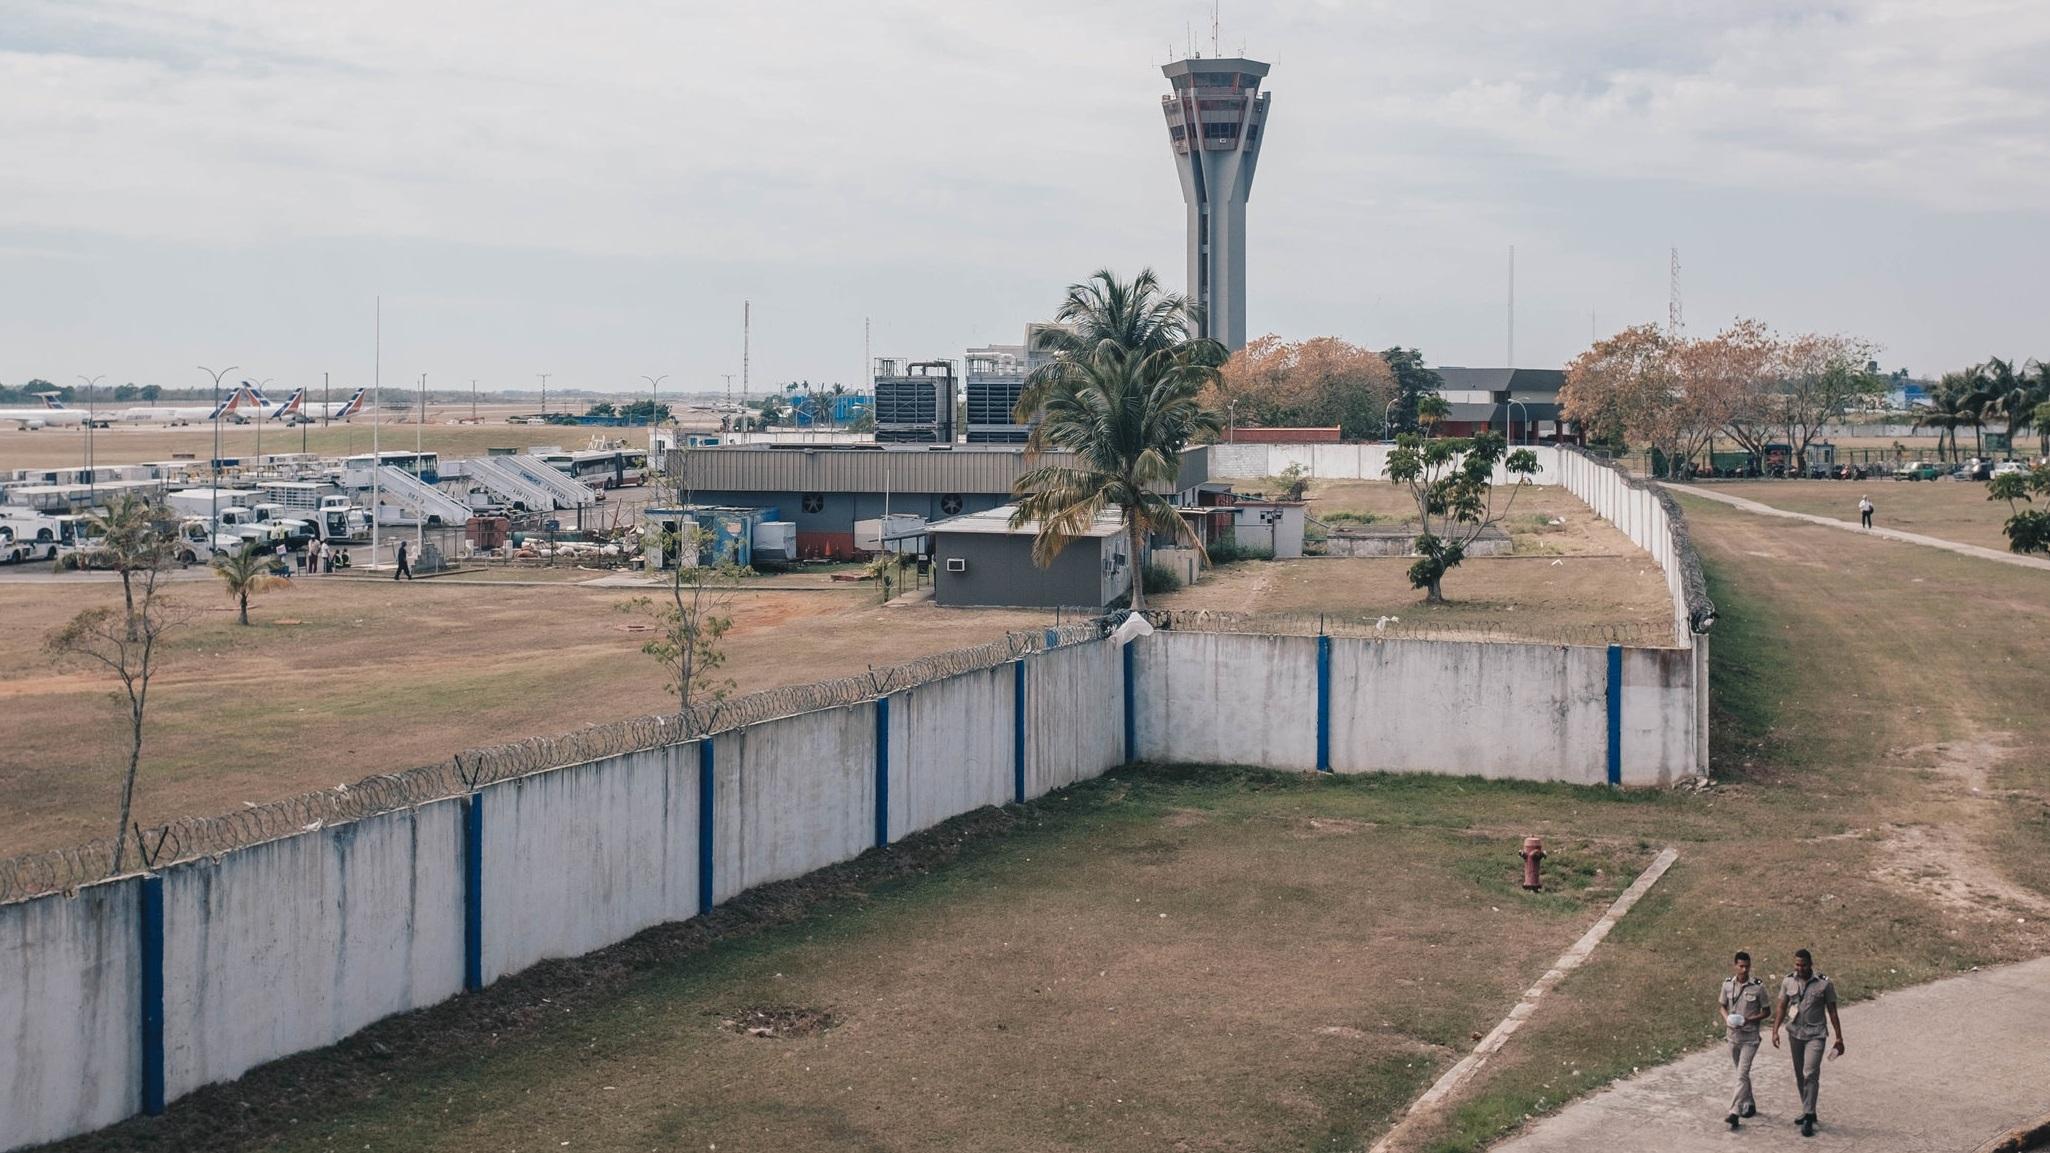 havana-airport.jpg